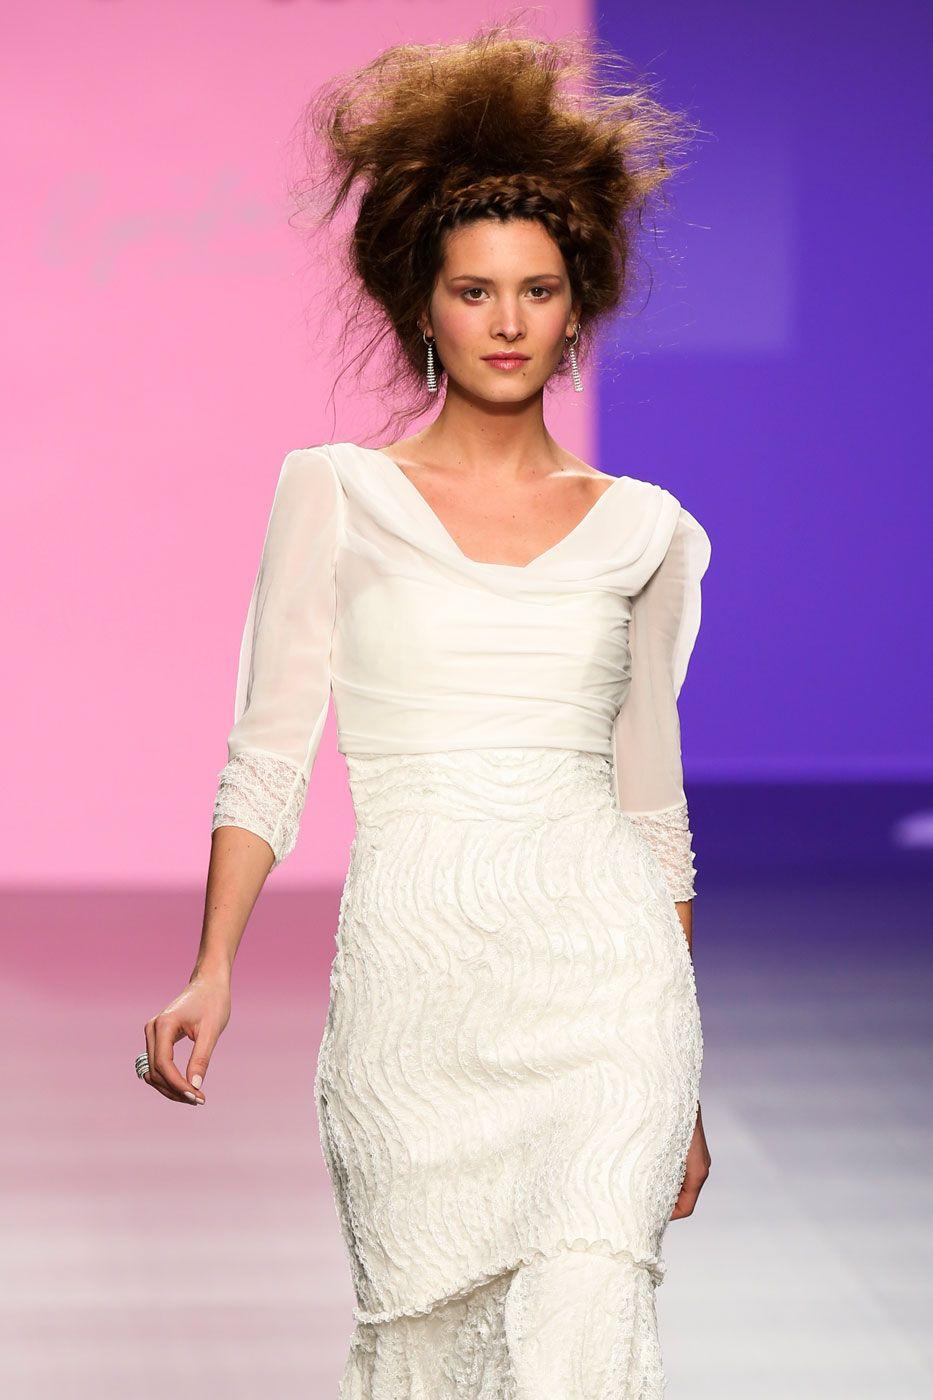 Discover ideas about Spring Summer 2015. Φορέματα με διαφάνεια στο μανίκι  ... 79766d0f463